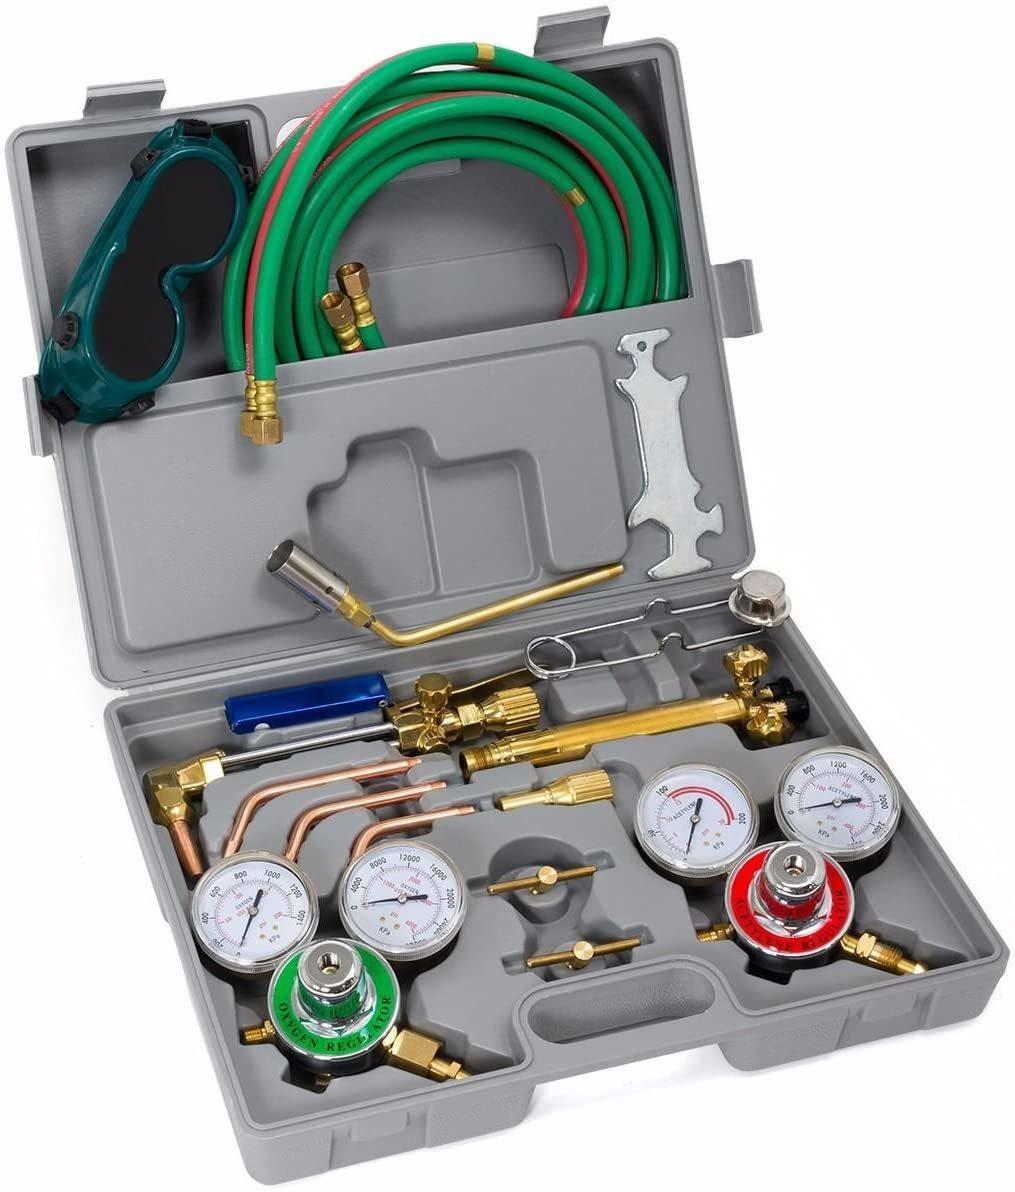 XtremepowerUS Premium Oxy Acetylene Welding Cutting Torch Kit